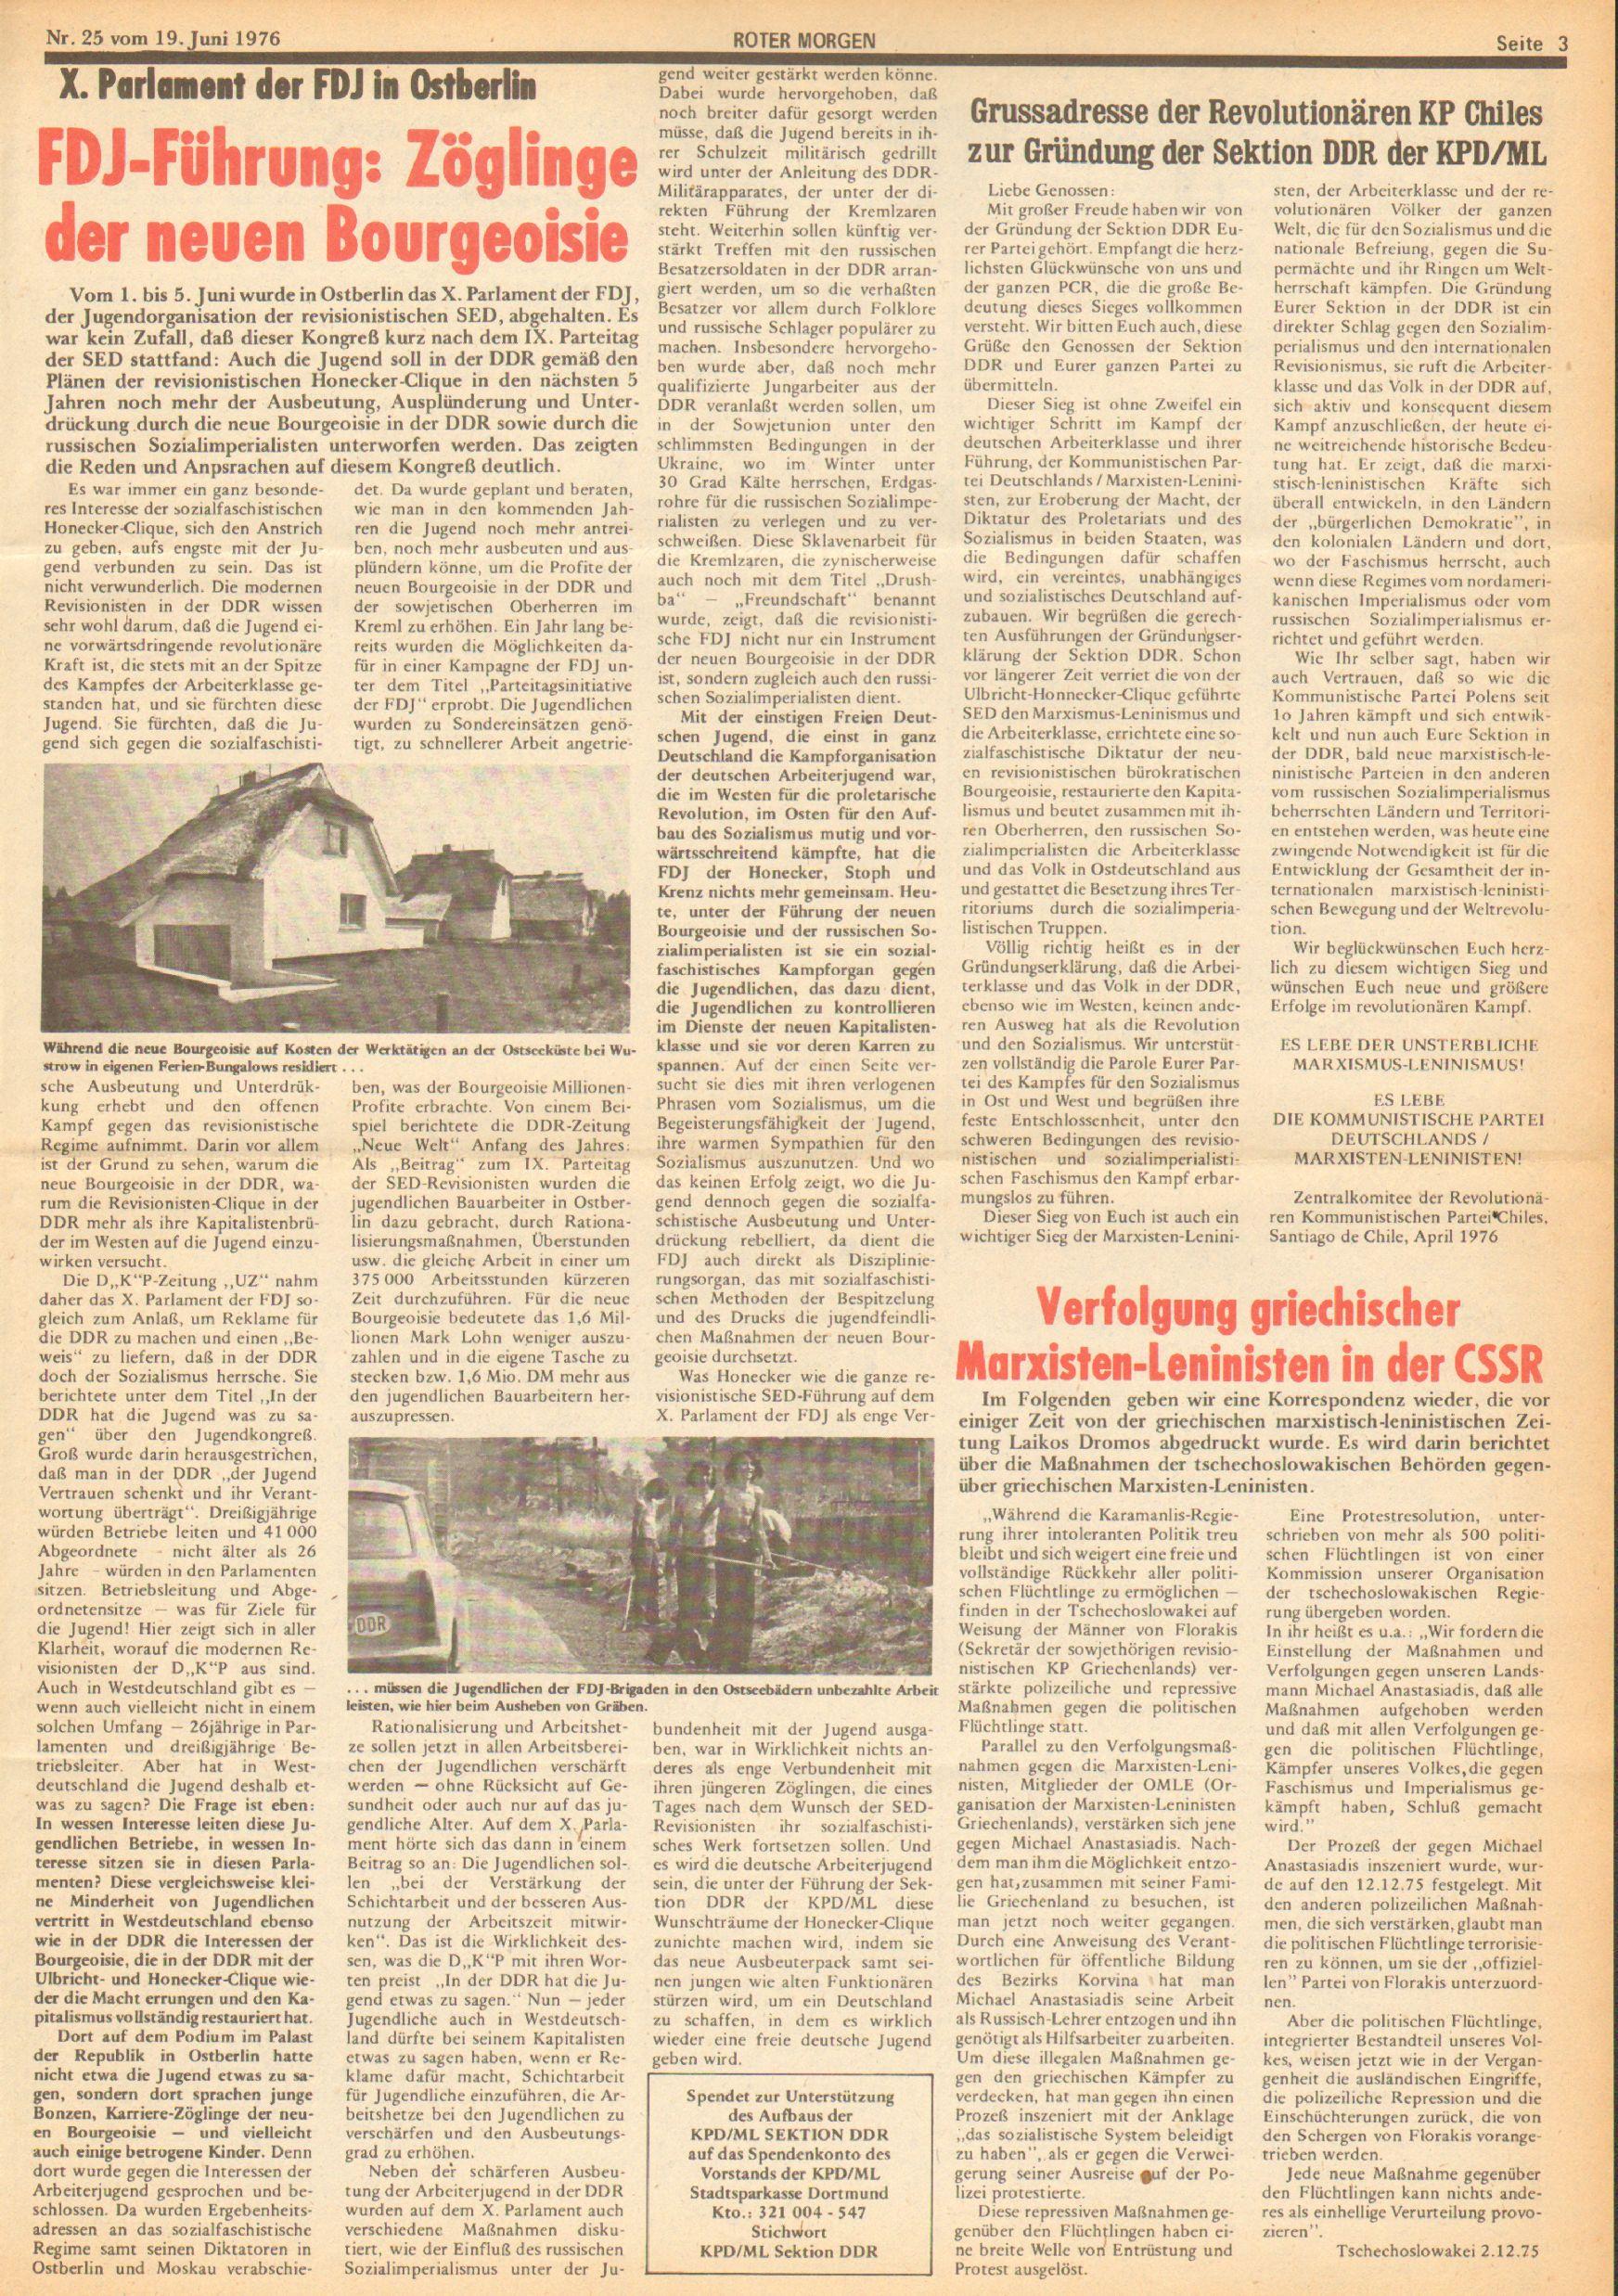 Roter Morgen, 10. Jg., 19. Juni 1976, Nr. 25, Seite 3